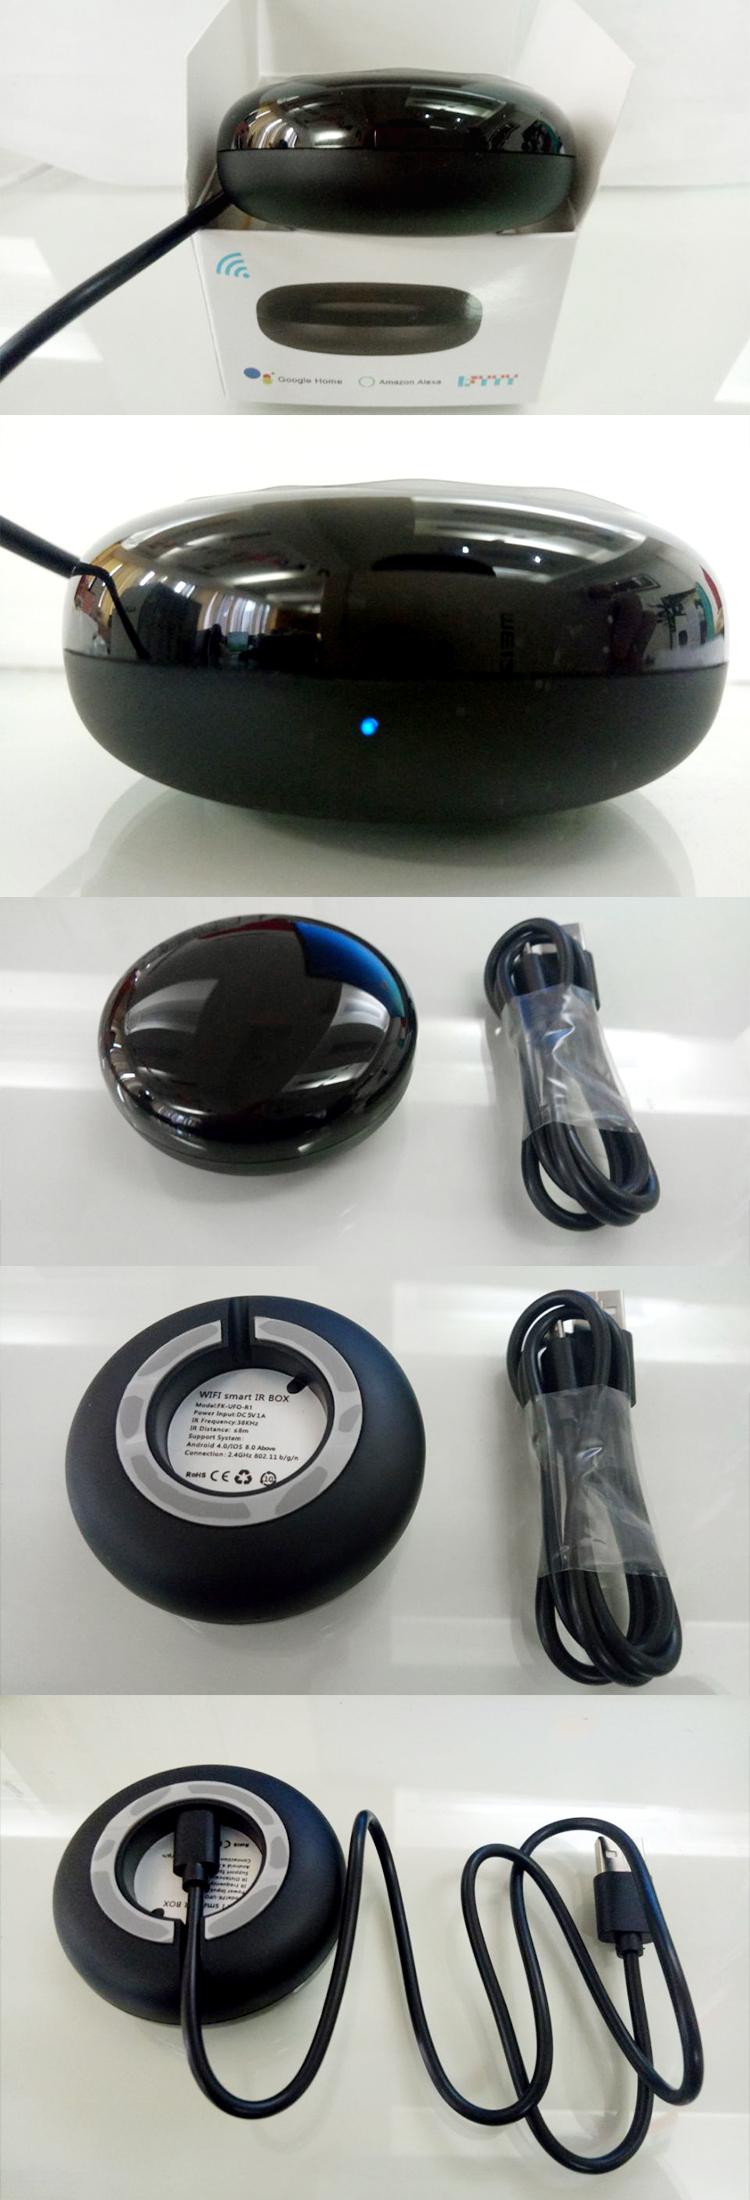 2019 US 2 Gang WIFI Switch Smart Home Automation dan Menyentuh Dinding Switch untuk Otomatisasi Rumah